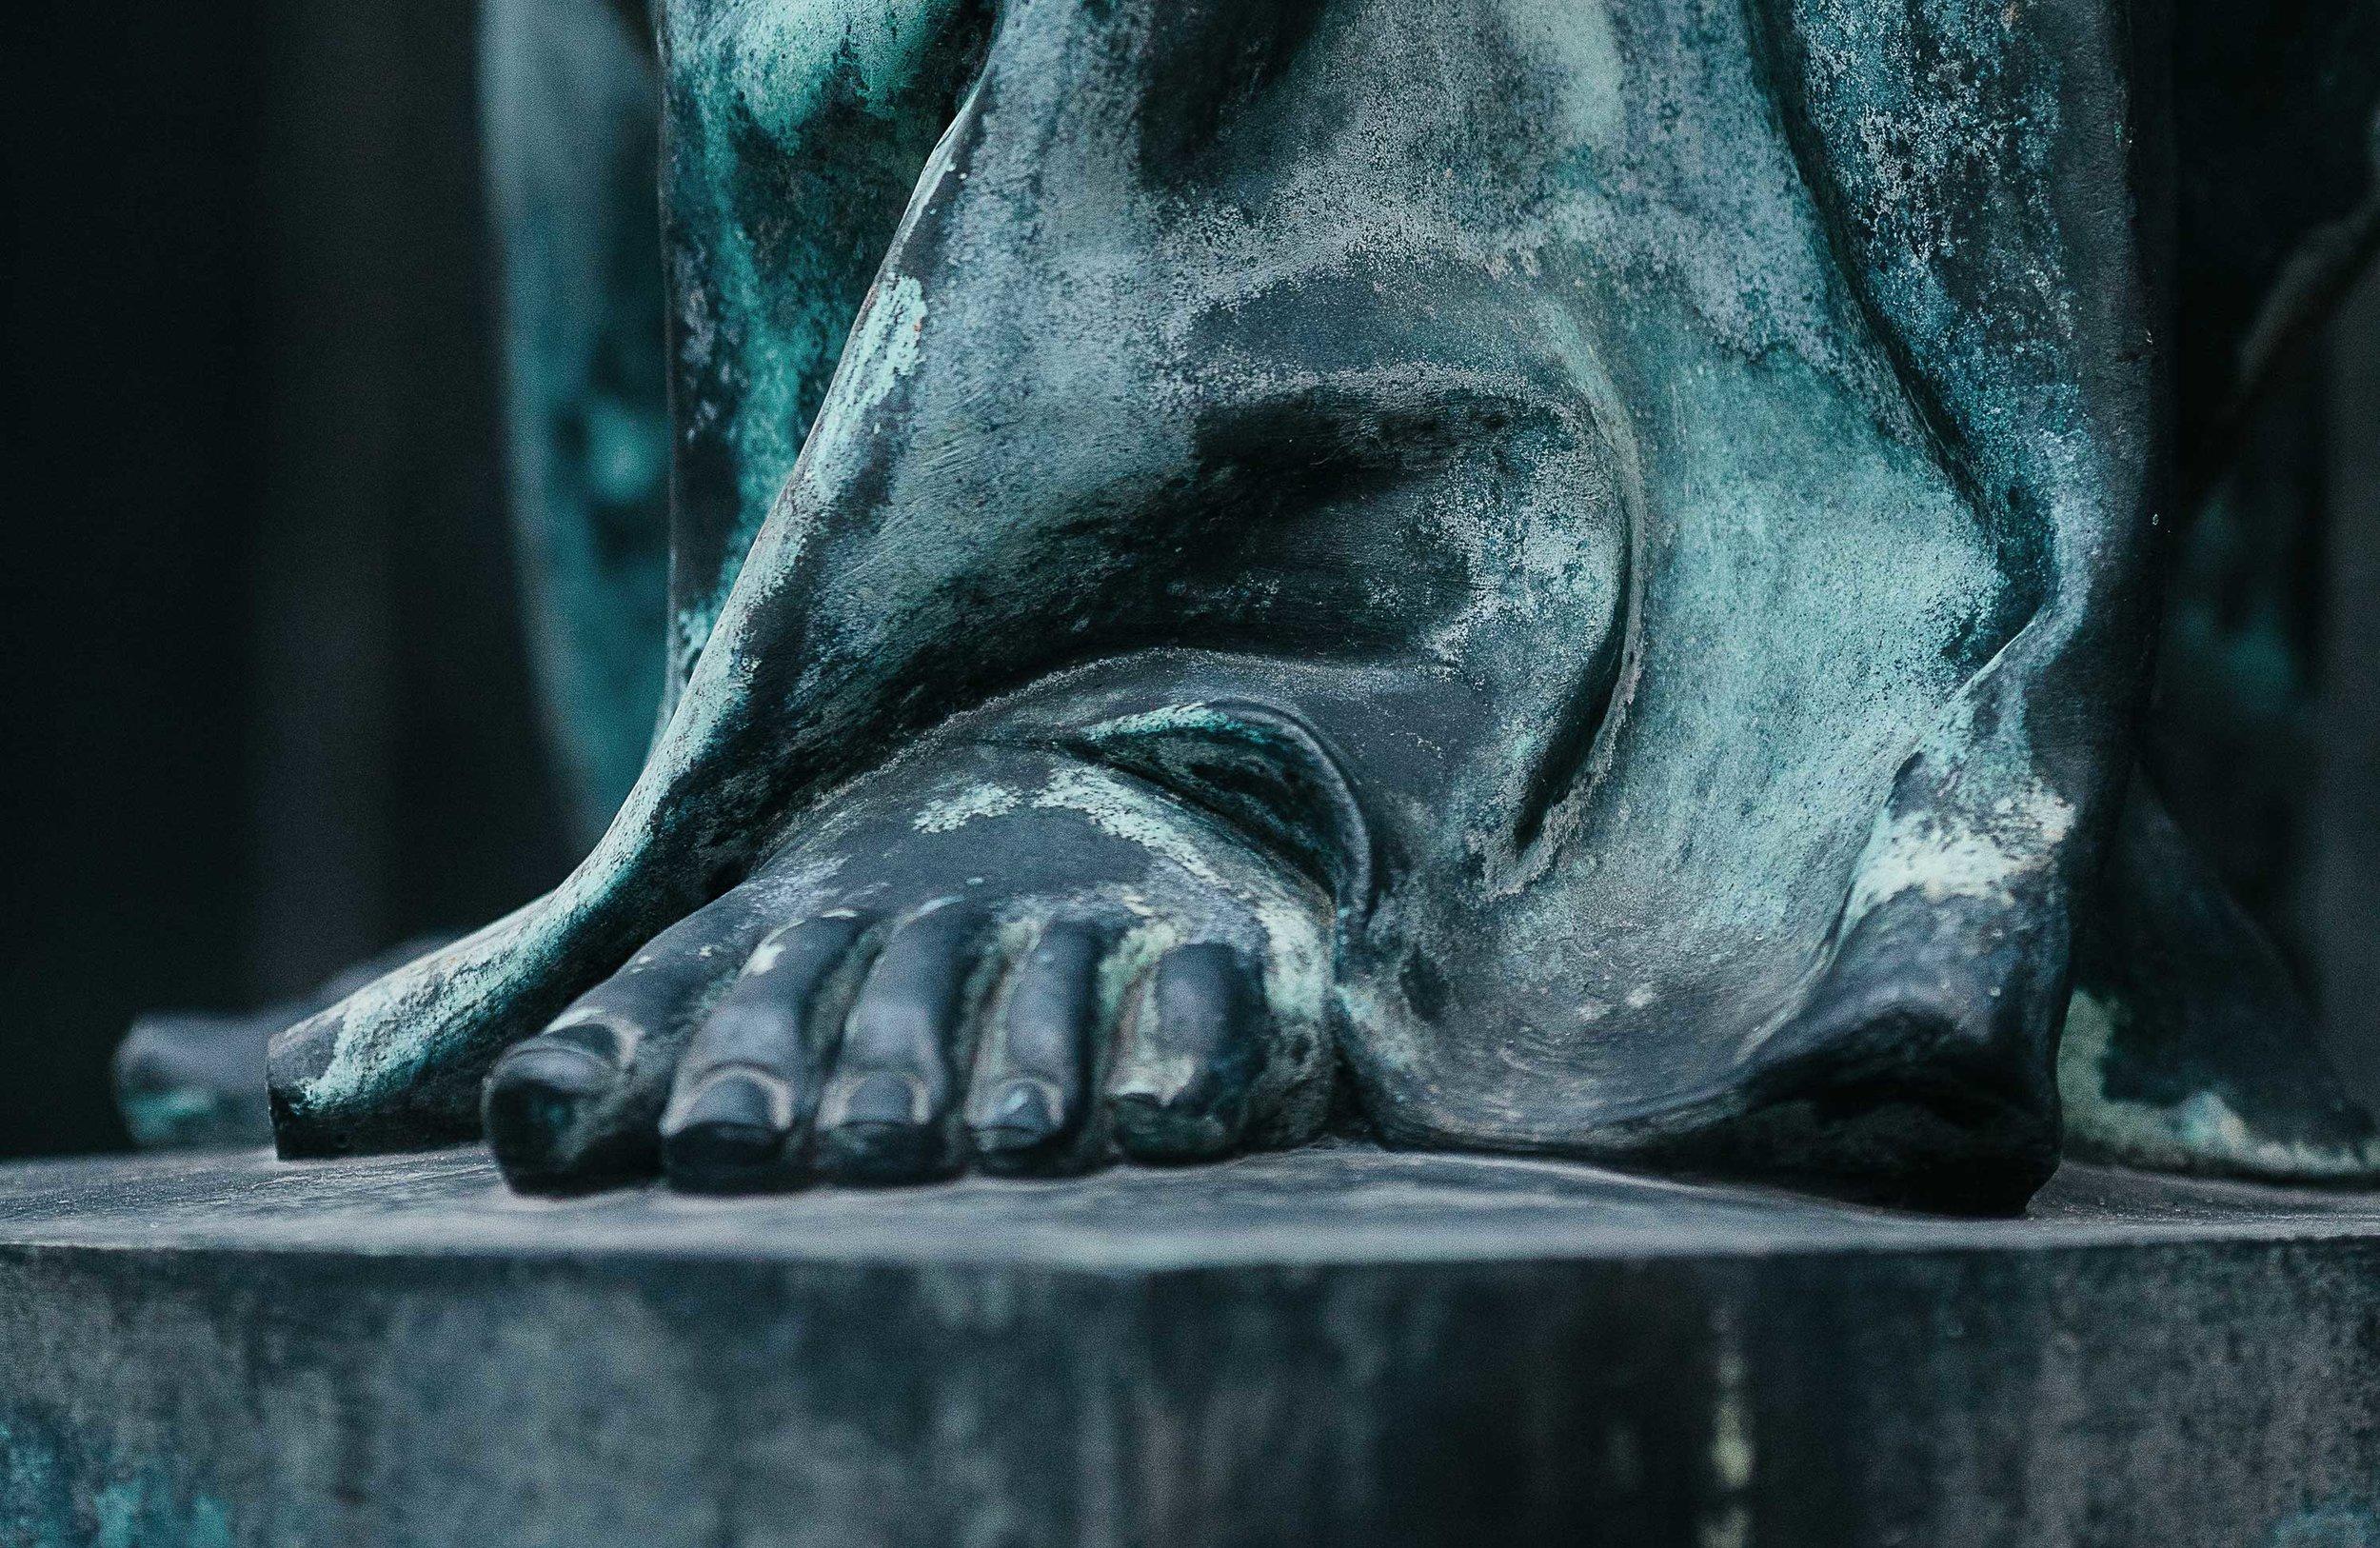 Statue-20_web.jpg